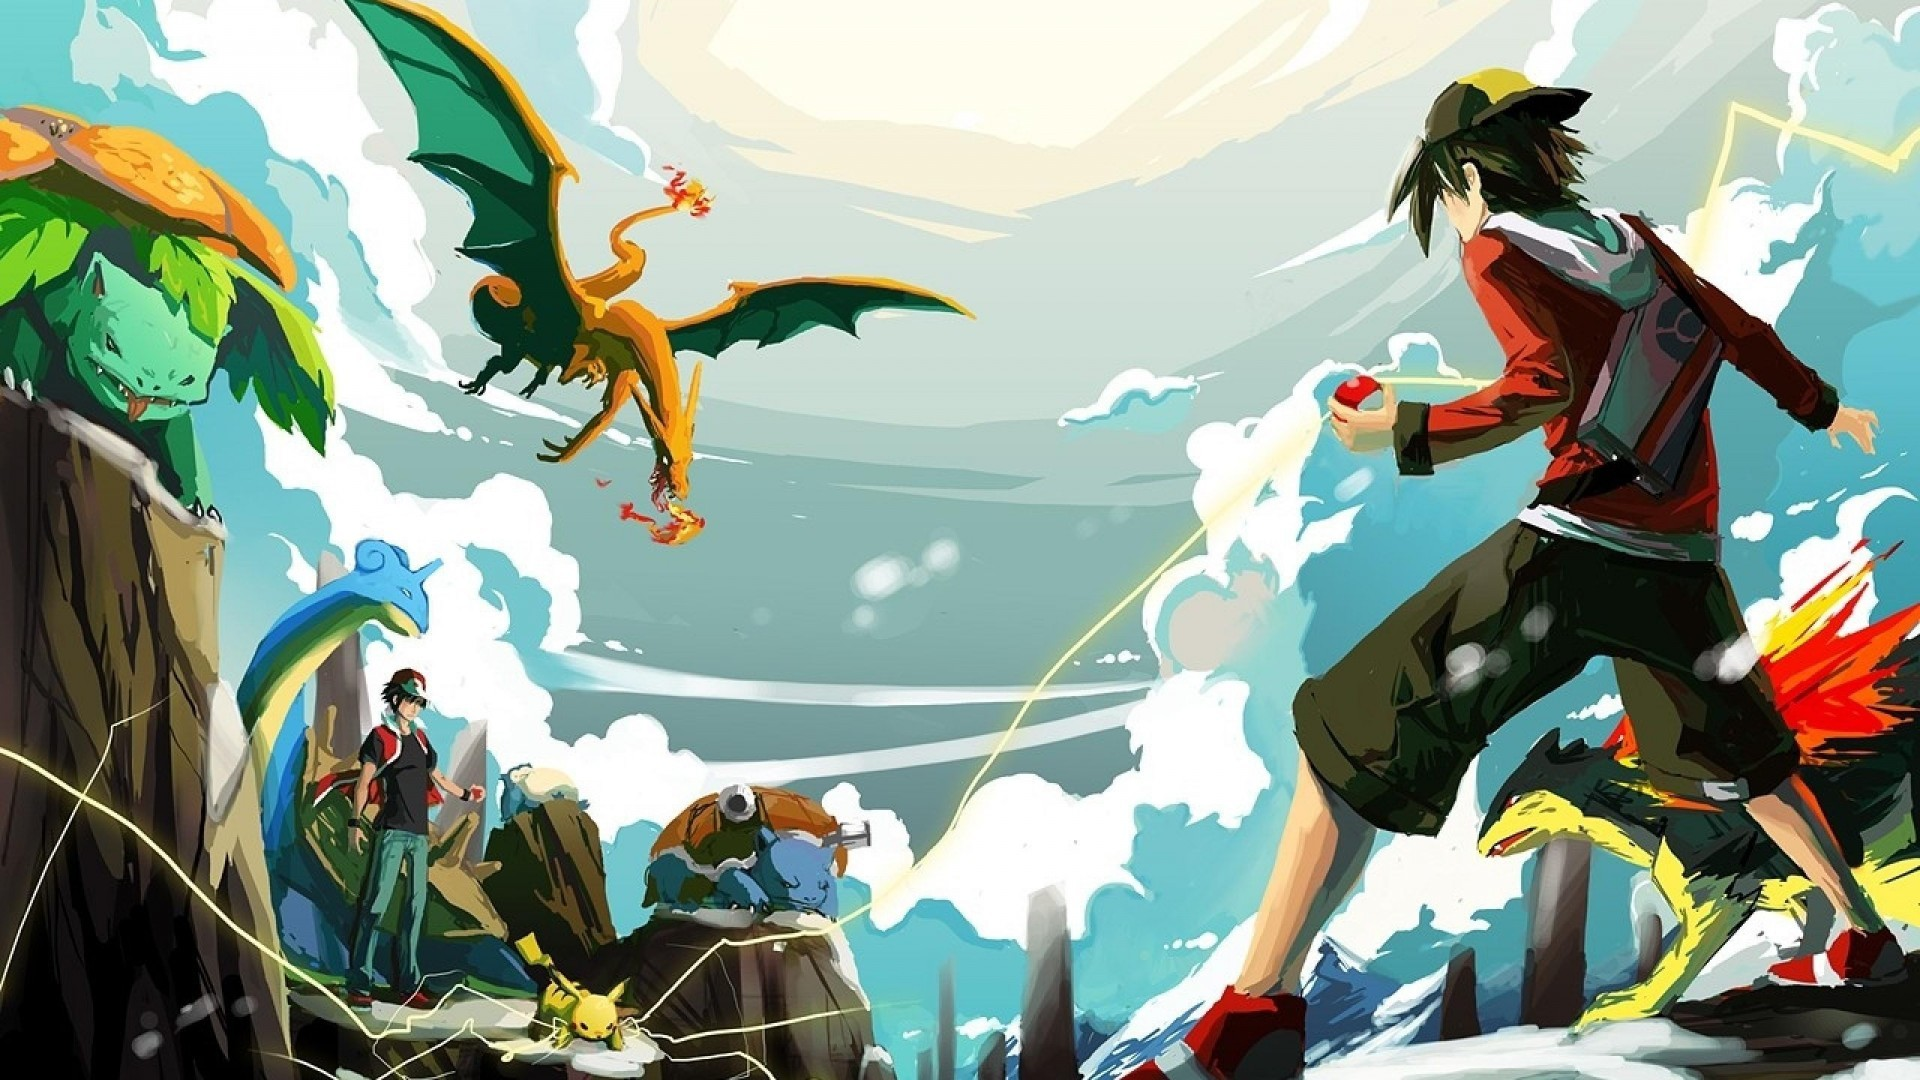 Pokemon Wallpaper 1920x1080 70 Pictures